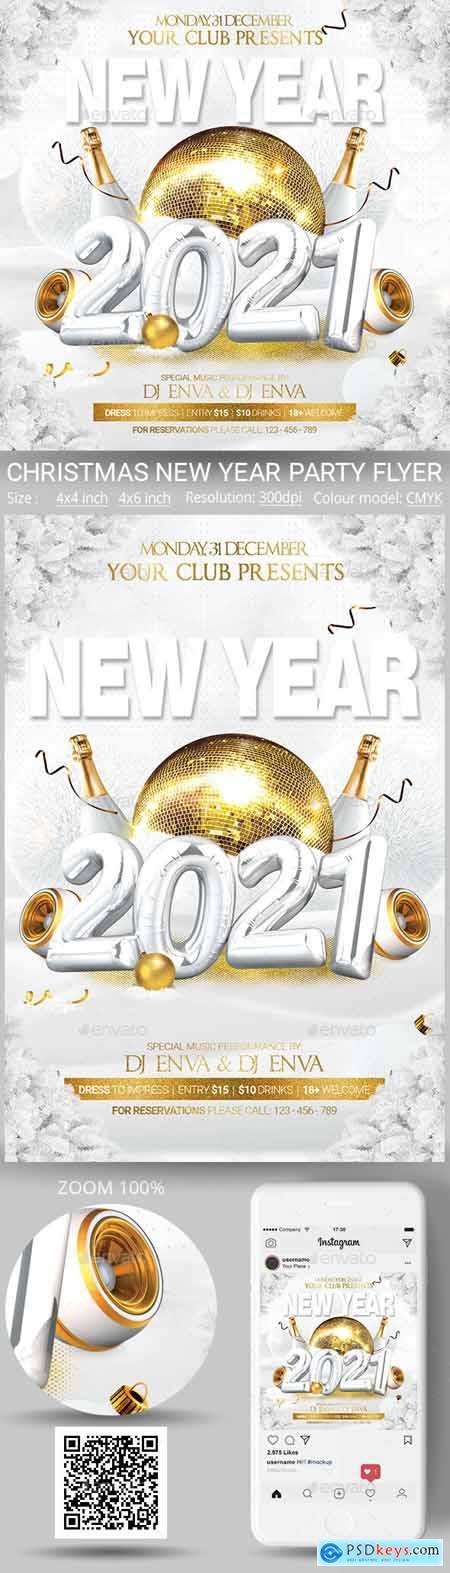 2021 New Year 25227148